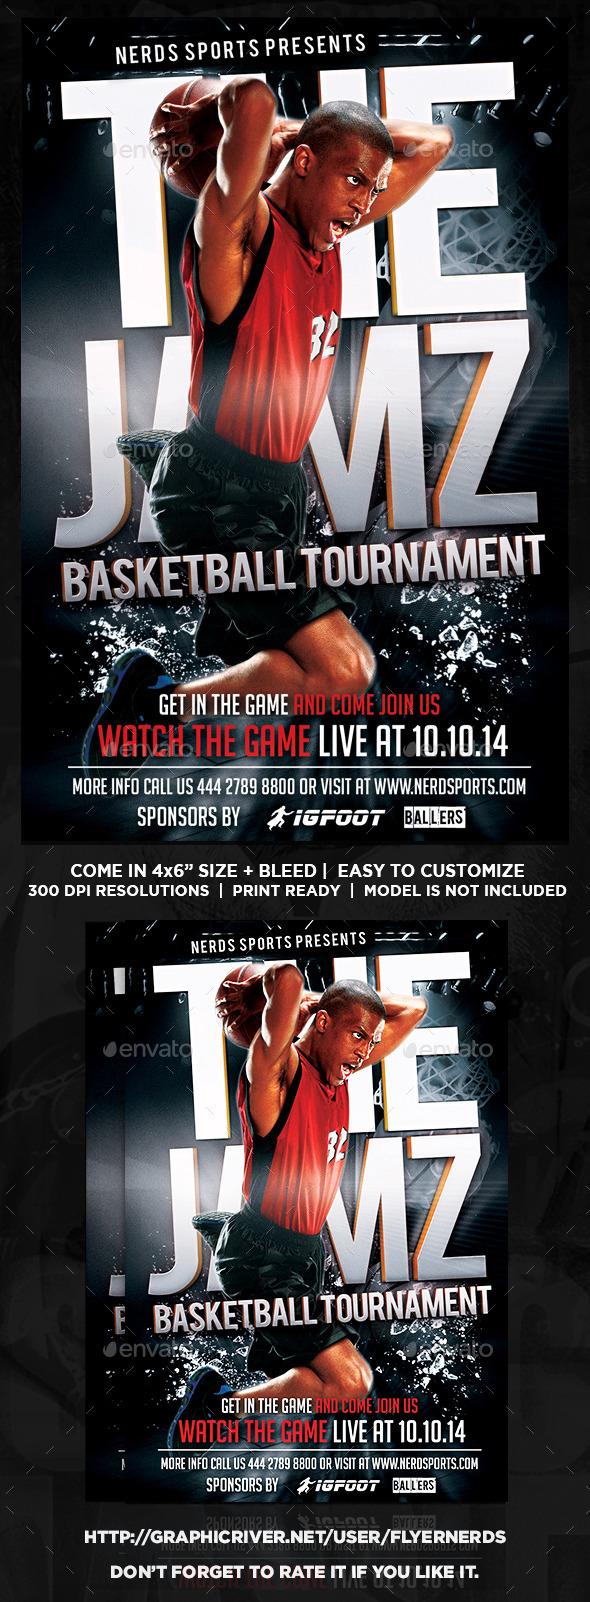 Basketball Jamz Sport Flyer - Sports Events